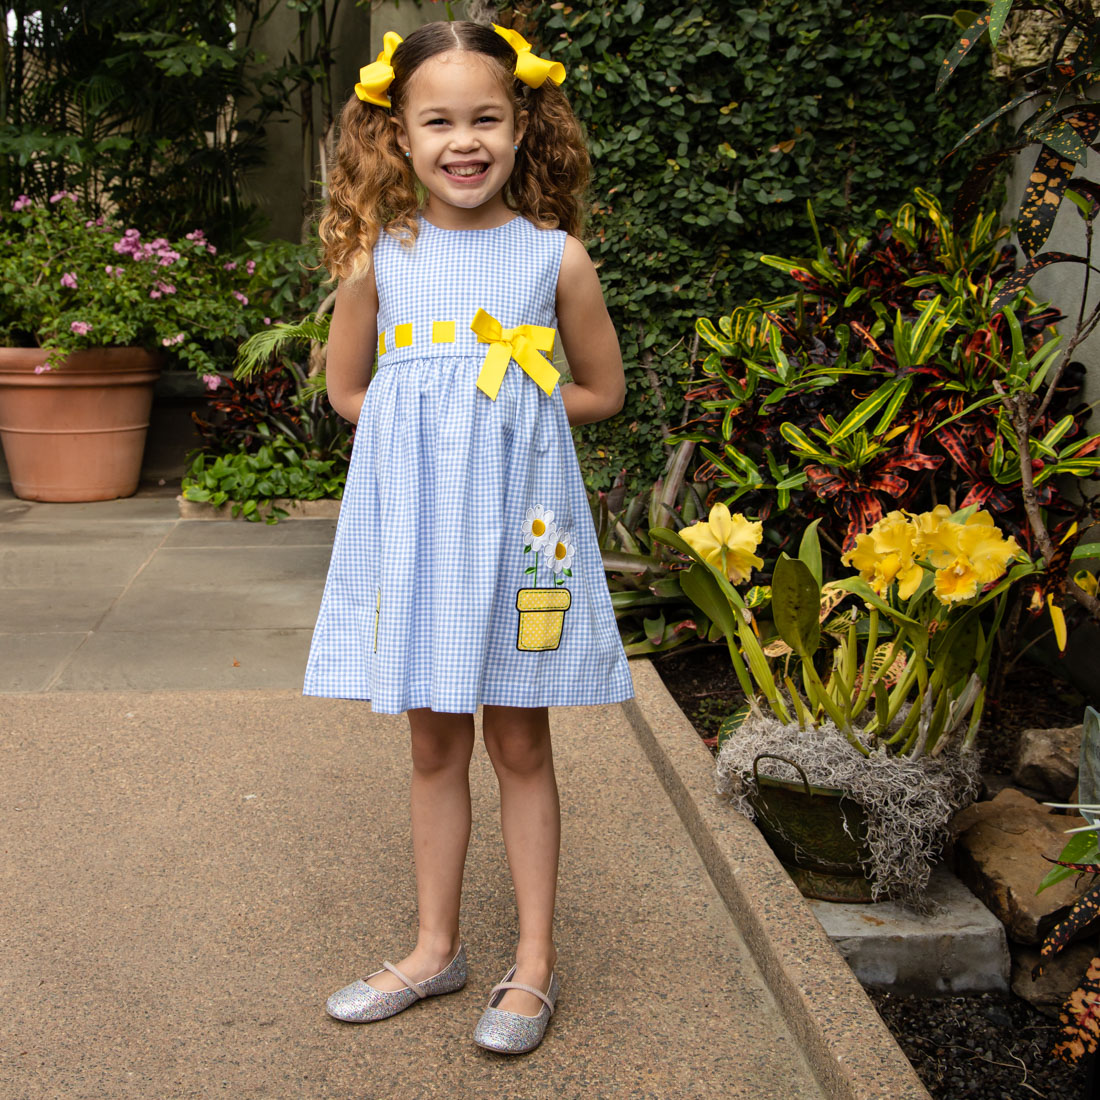 Shop Kids, Infants & Toddlers Rompers & Dresses